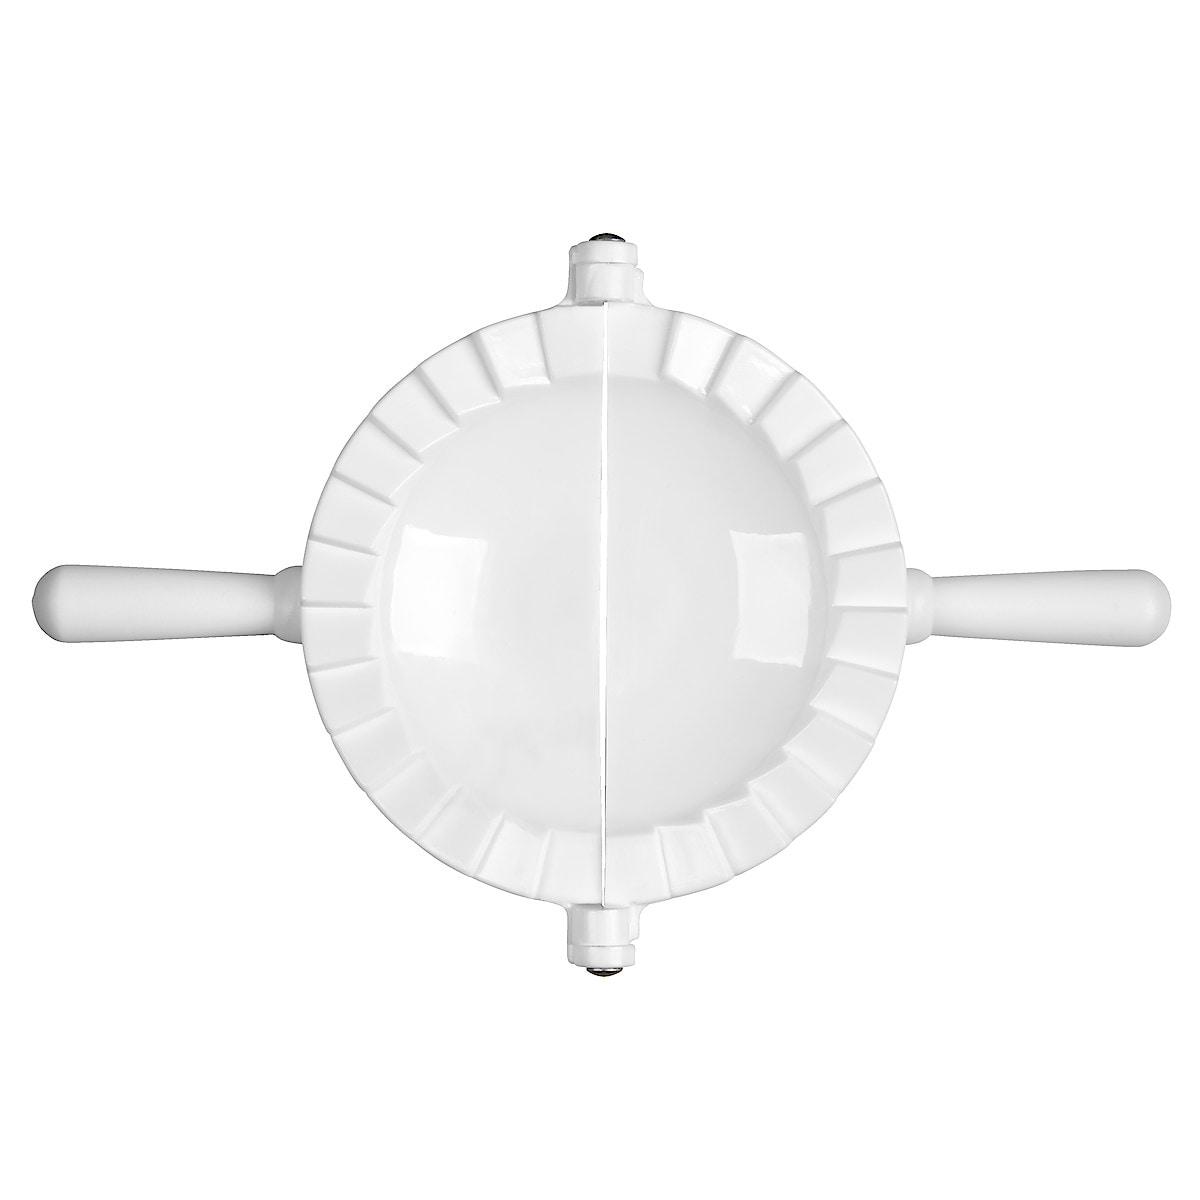 Dumpling Maker with Rolling Pin